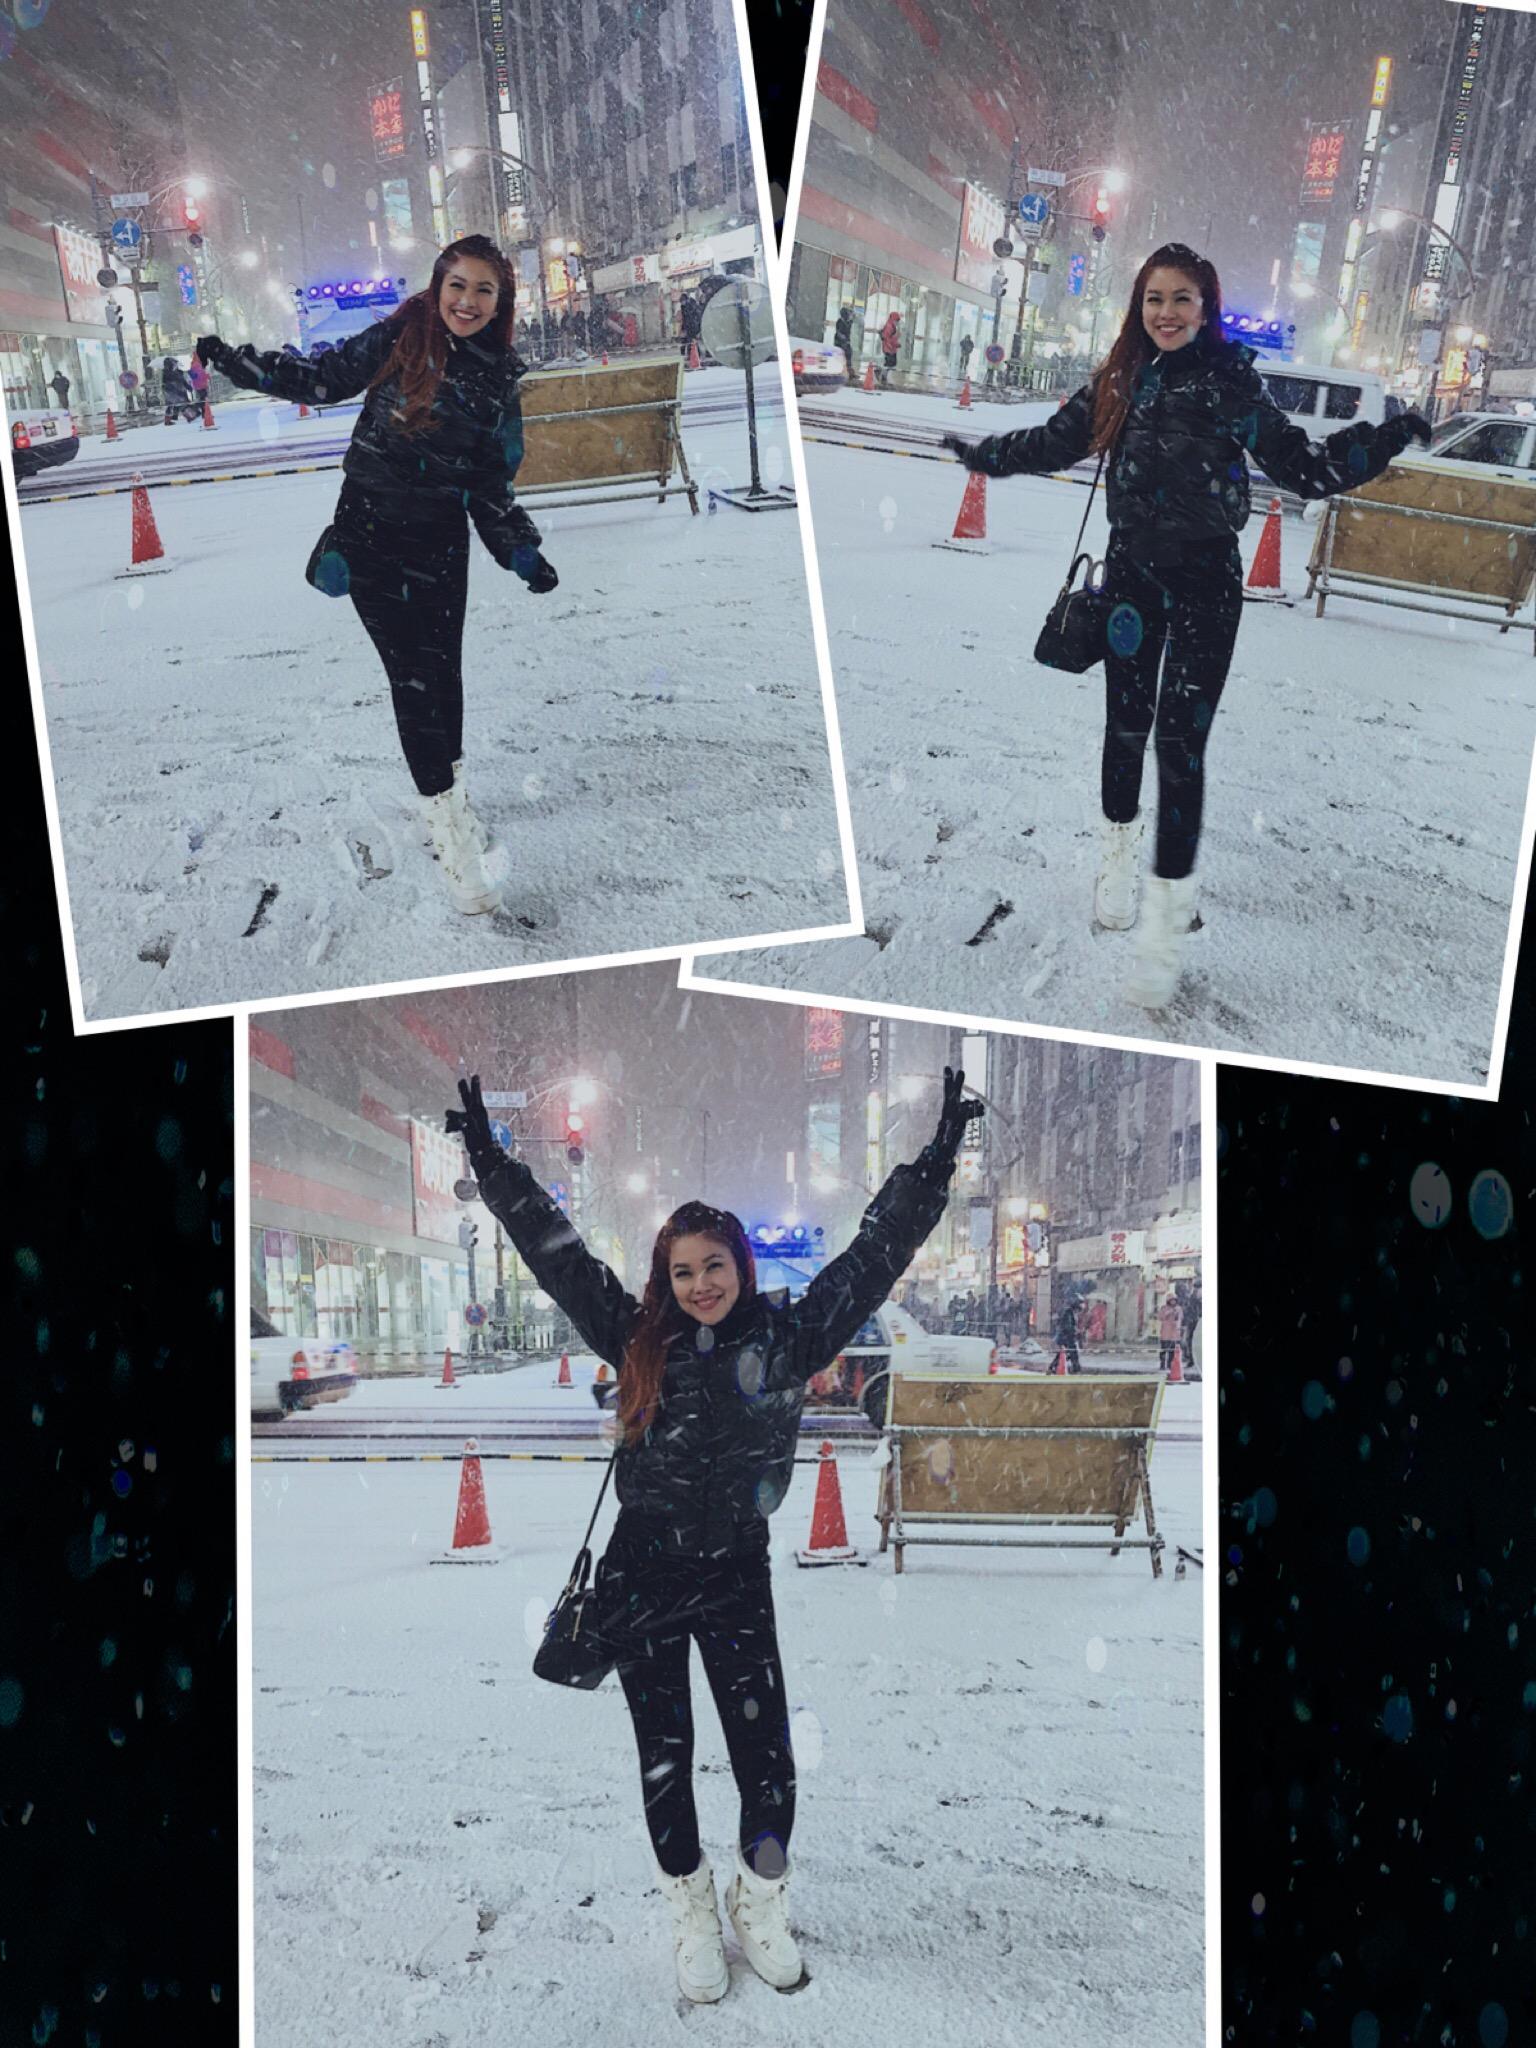 Bianca Valerio Snow Sapporo